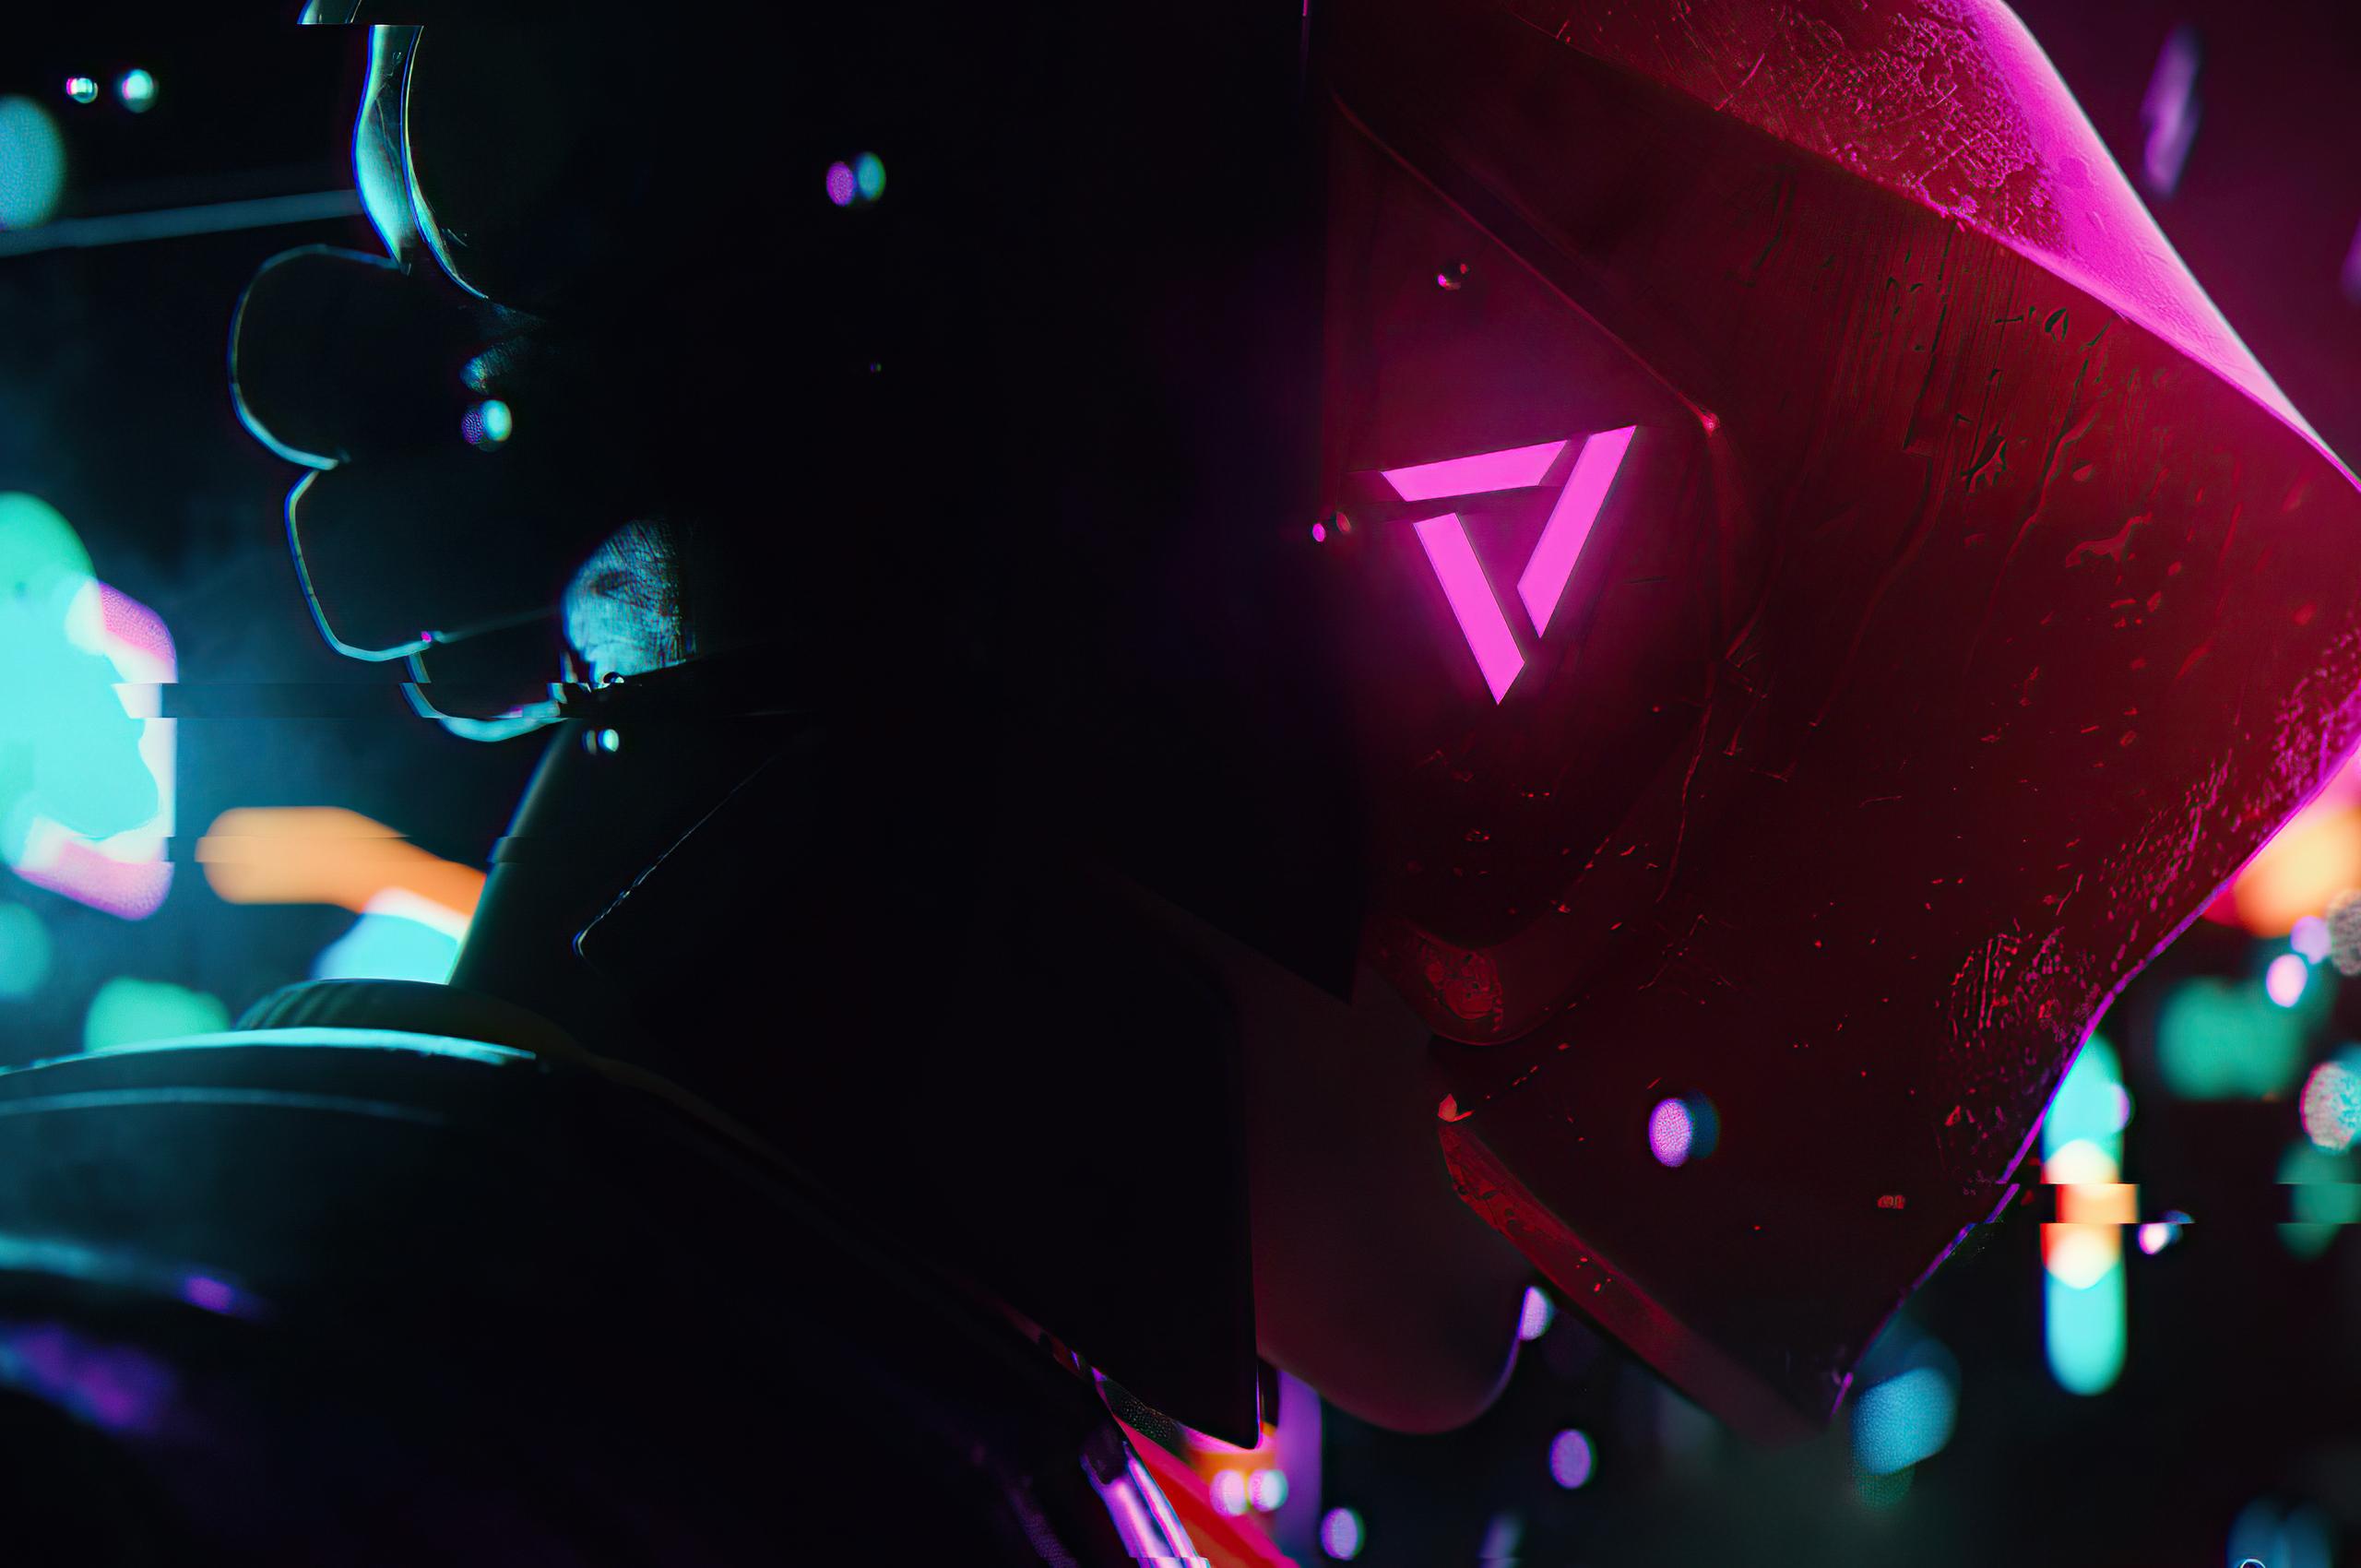 cyberpunk-warrior-in-rain-5k-q9.jpg